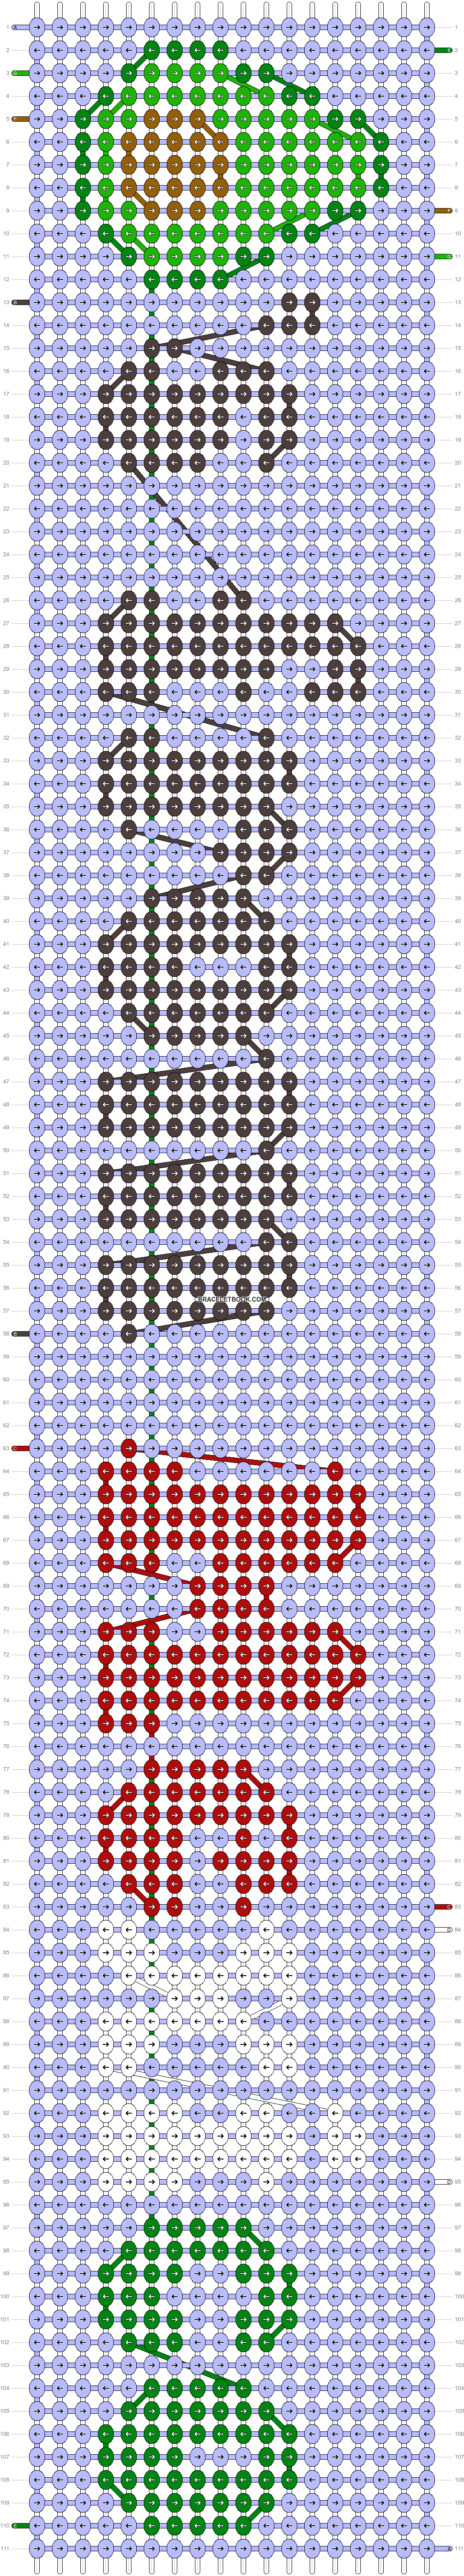 Alpha pattern #69333 pattern